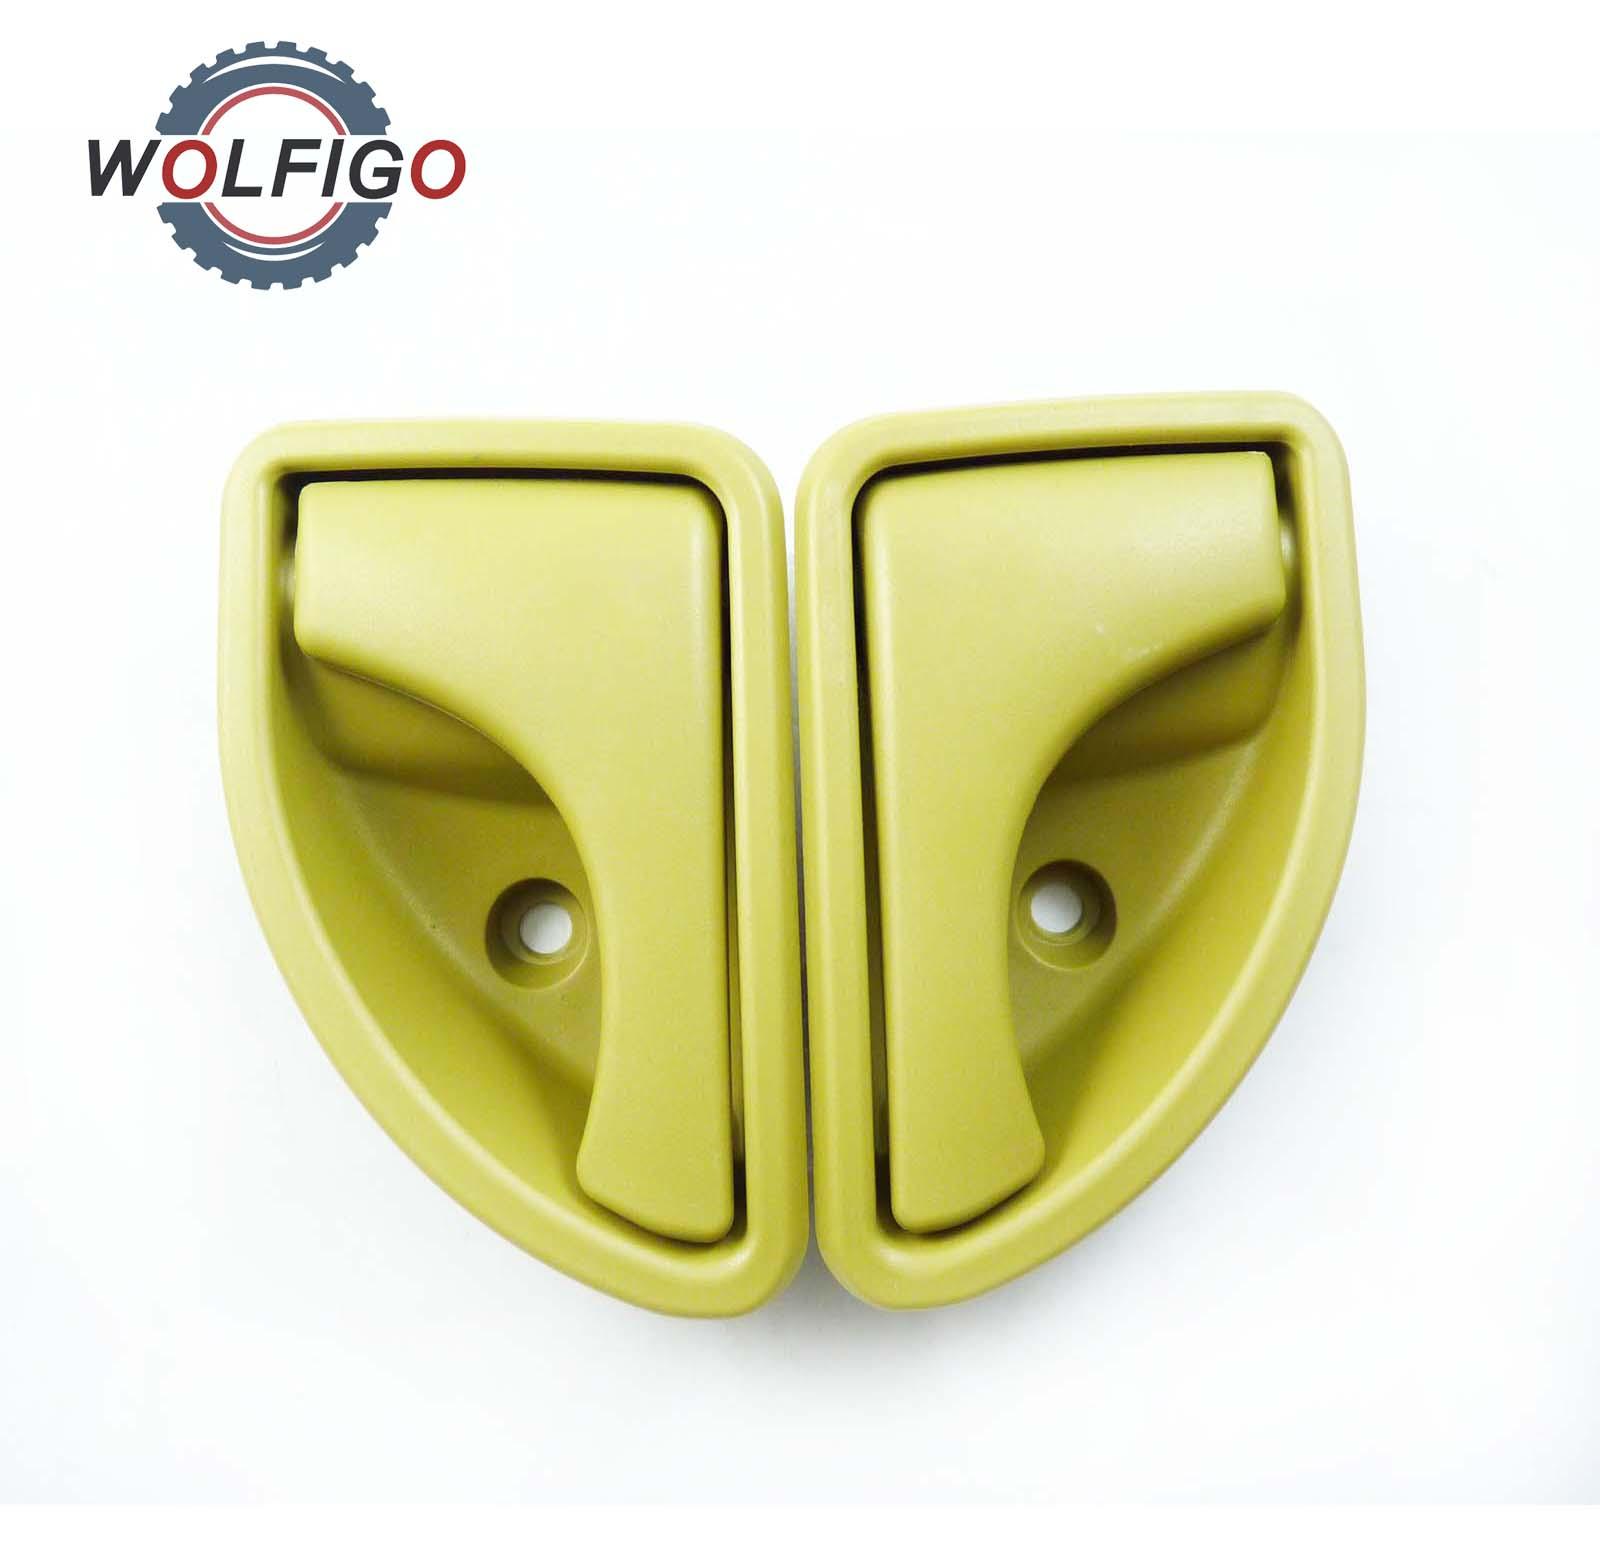 Automobiles & Motorcycles 8200177718 Backup Reverse Light Switch For Renault Safrane Trafic Twingo Vel Satis Avantime I Ii 1.2 1.4 1.6 1.9 2.0 2.2 2.5 3.0 Automobiles Sensors